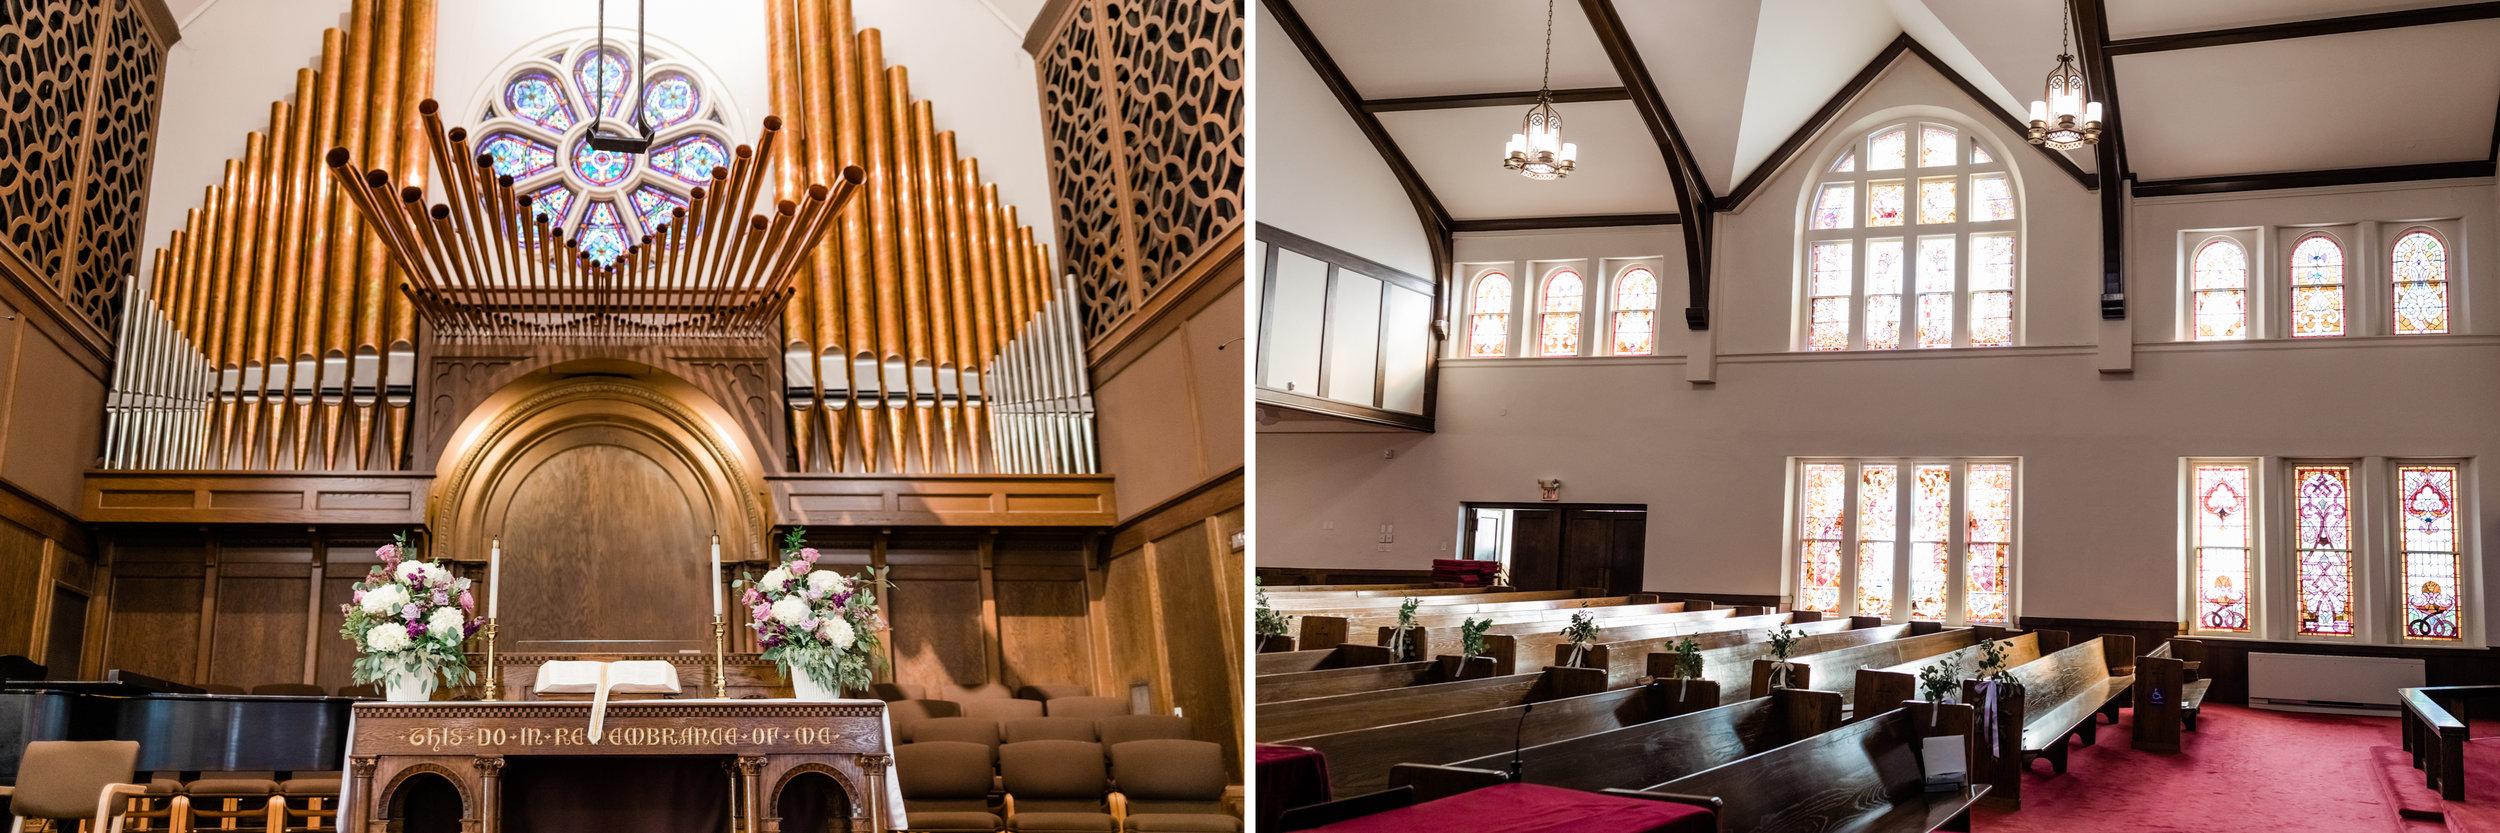 Lawrence Kansas Wedding United Methodist Chuch 28.jpg